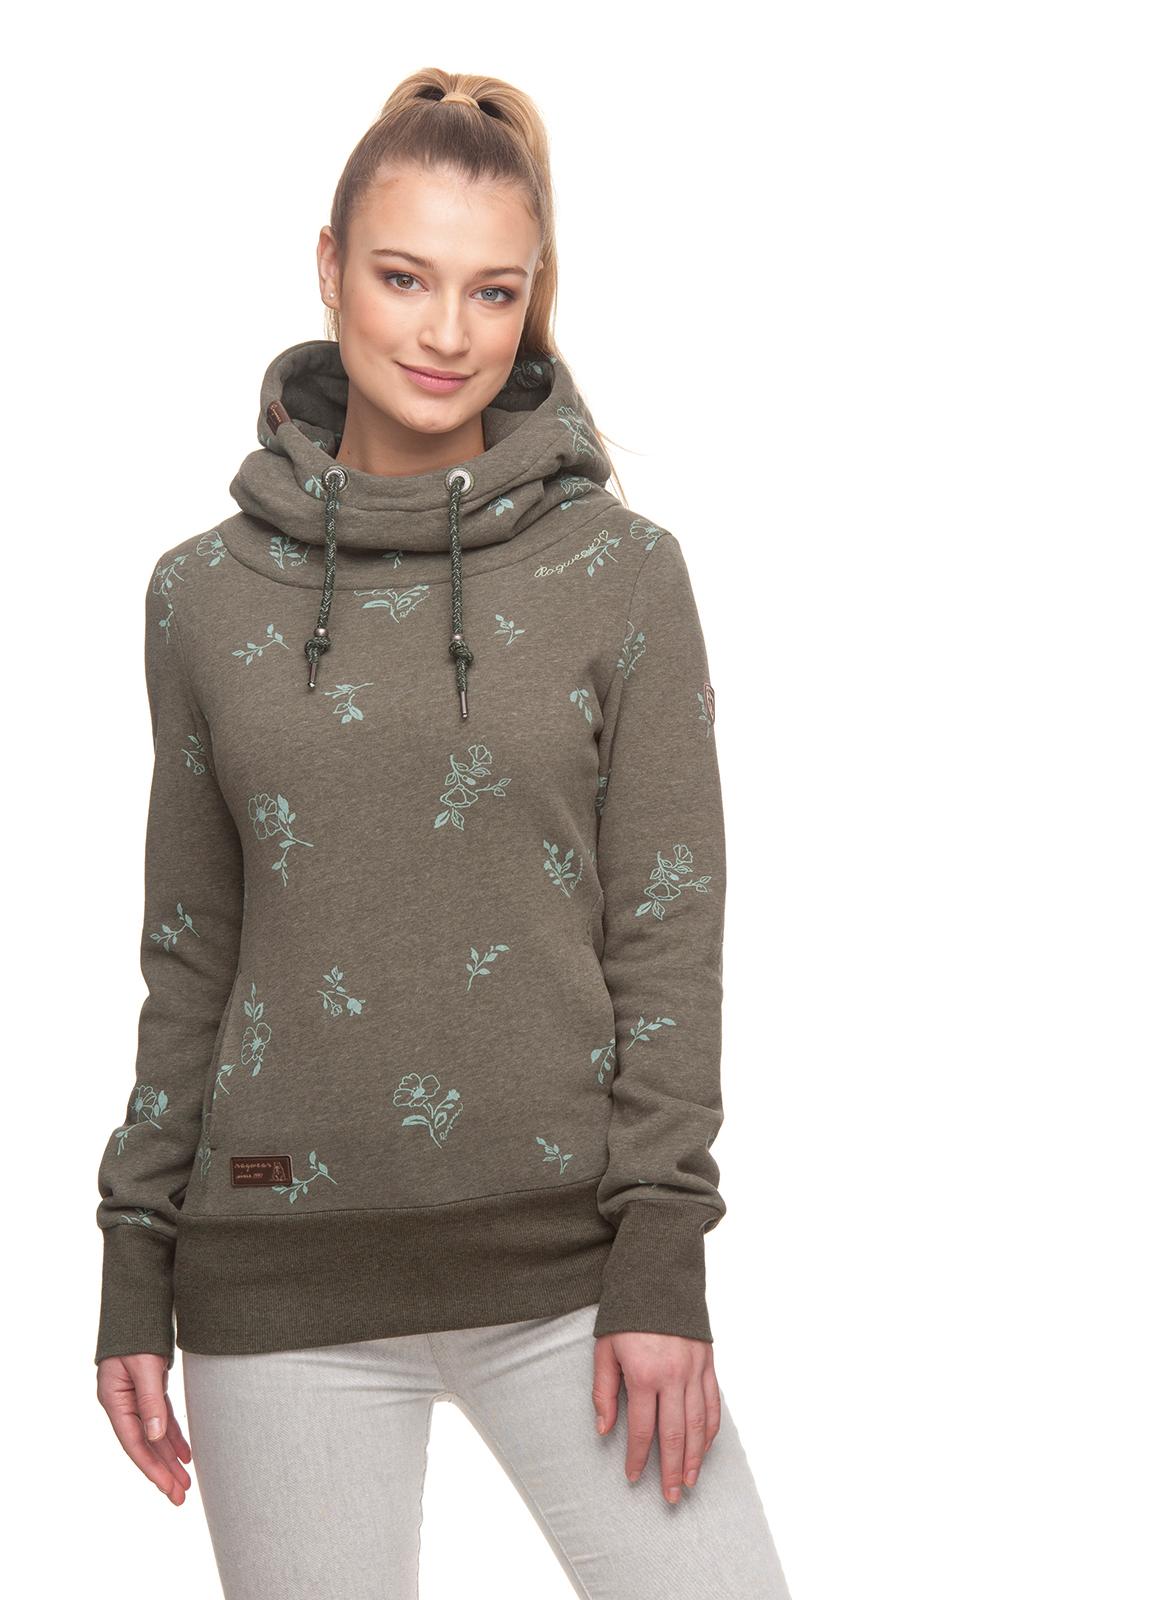 Ragwear Yoda Flowers Sweat Shirt - Olive